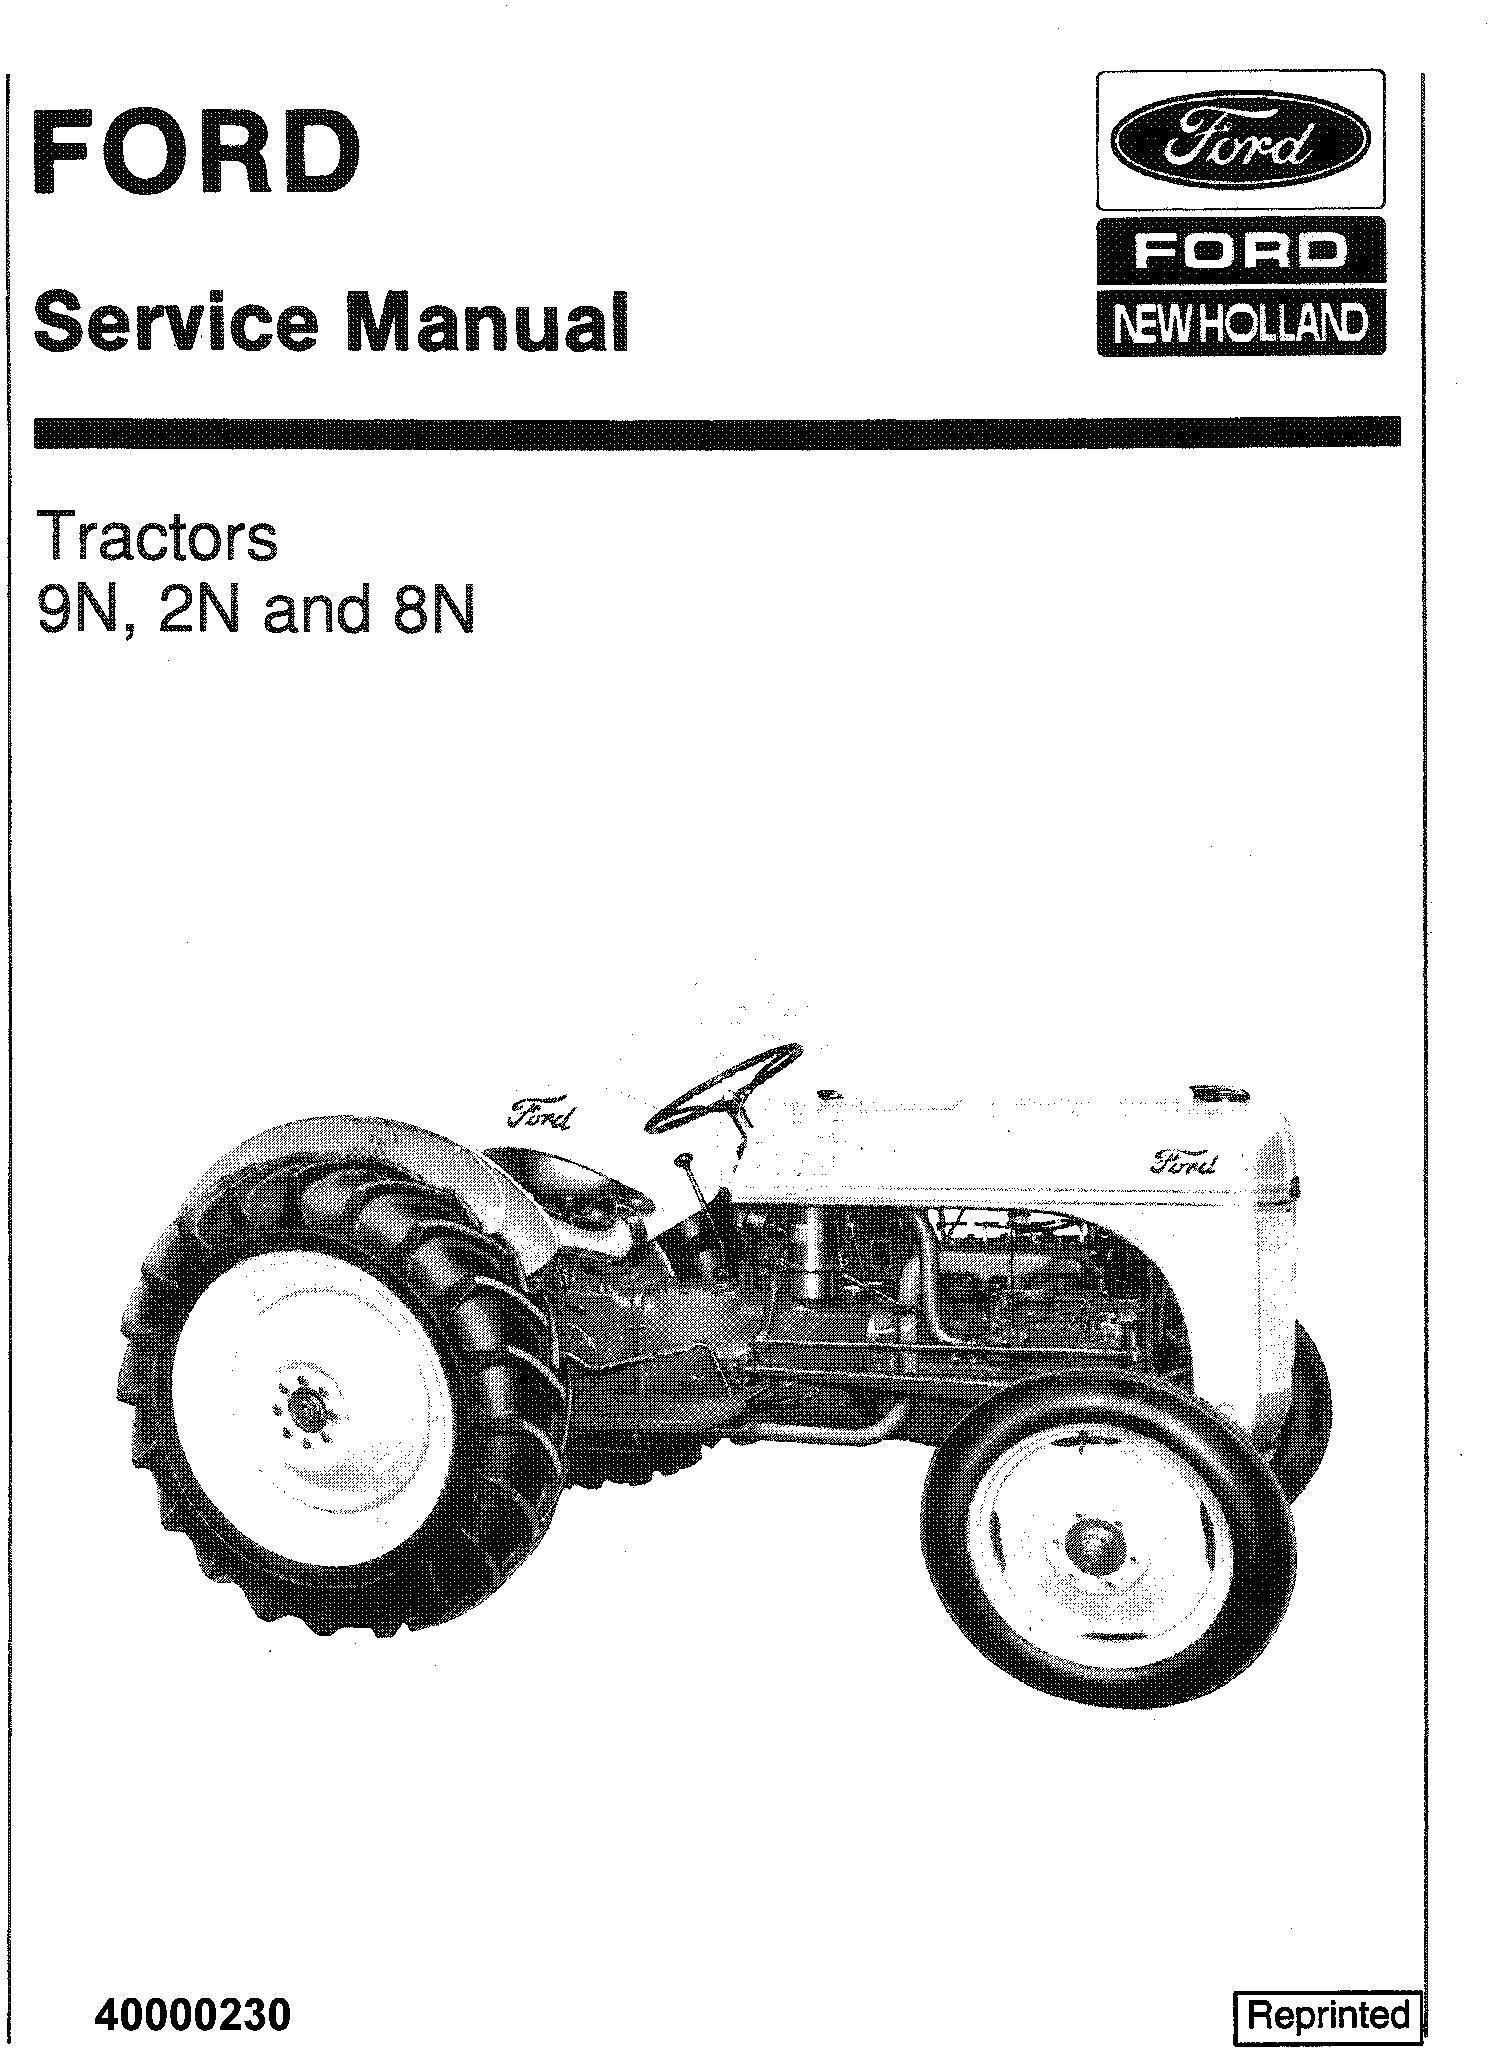 Ford 9n 2n 8n Tractor Service Manual Deere Technical Manuals